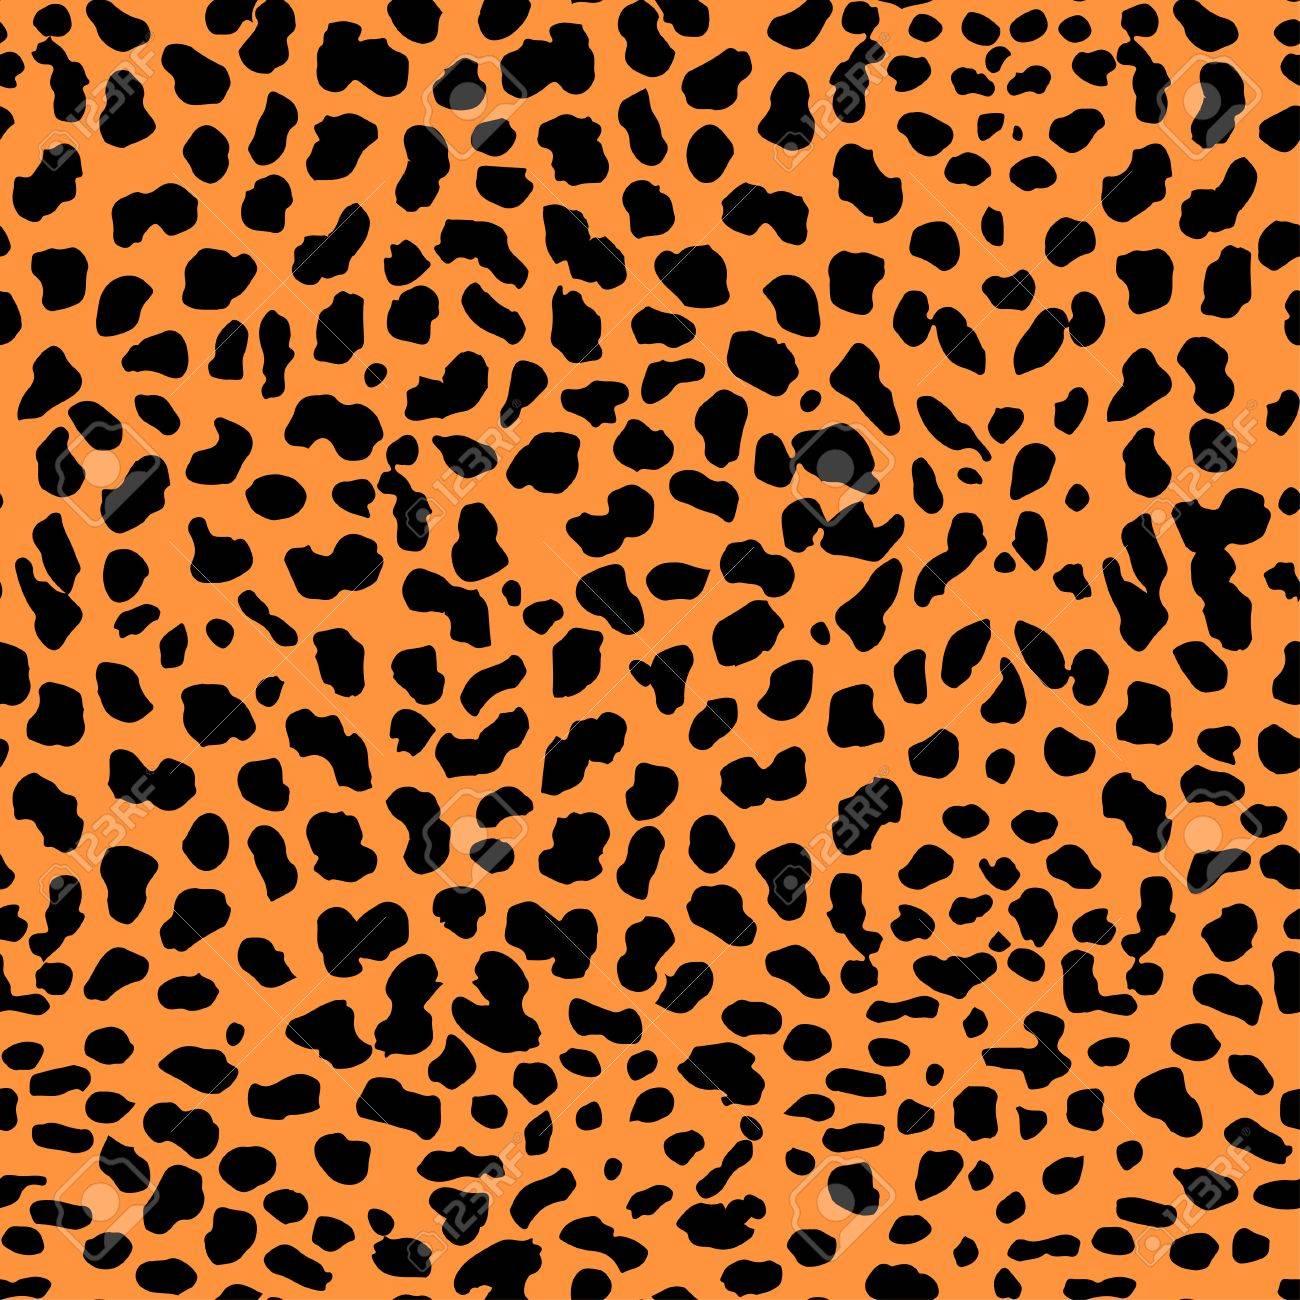 Vector Illustration Of Leopard Print Seamless Pattern Wild Texture